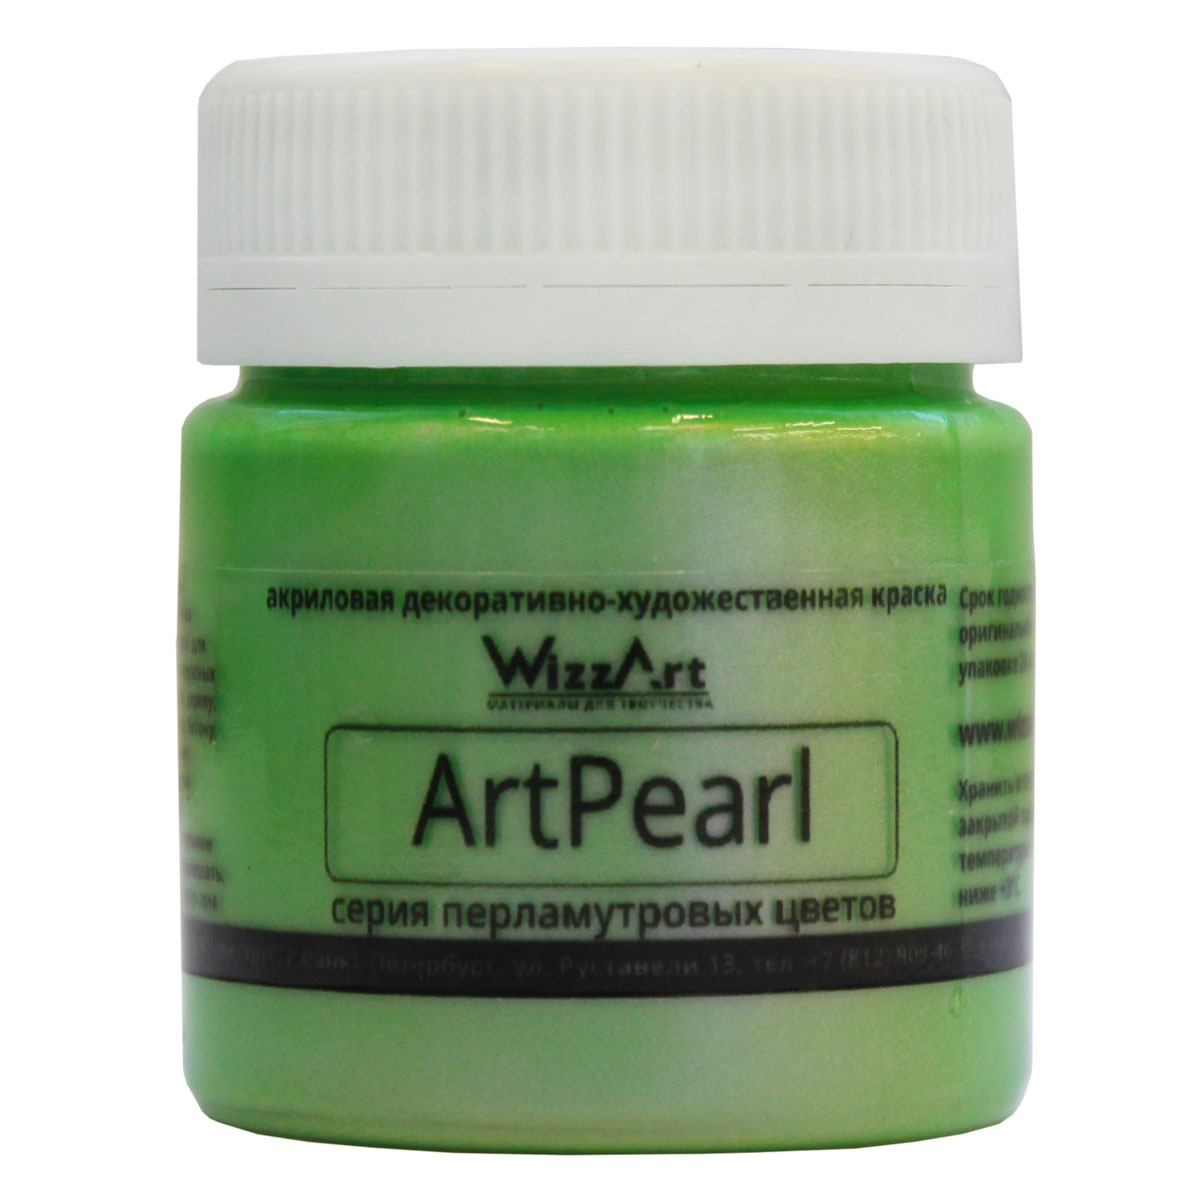 Краска акриловая Wizzart ArtPearl. Хамелеон, цвет: салатовый, 40 мл501049